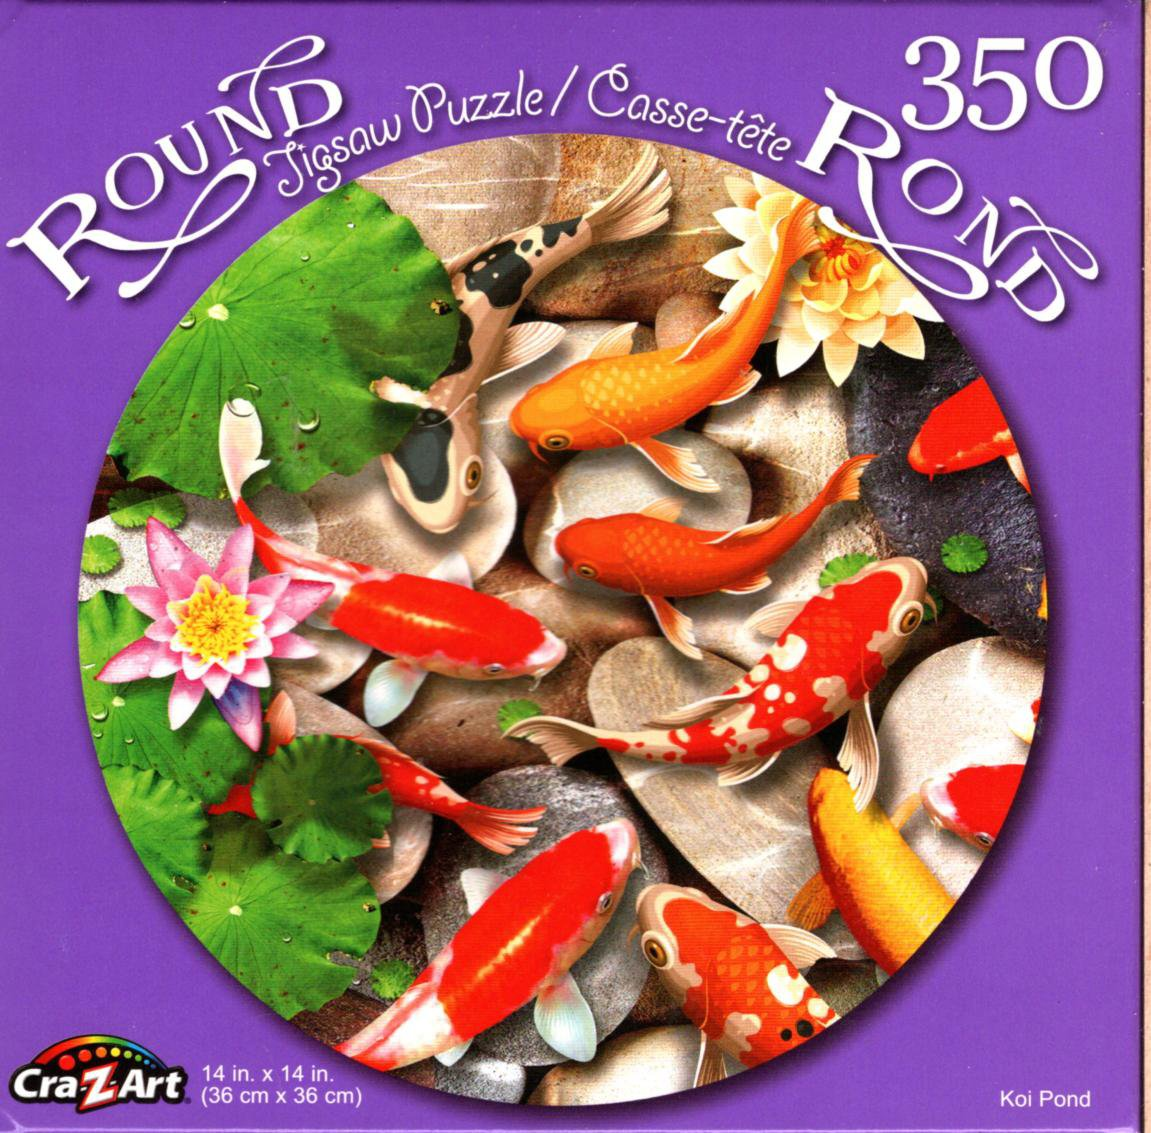 Koi Pond - 350 Round Piece Jigsaw Puzzle for Age 14+